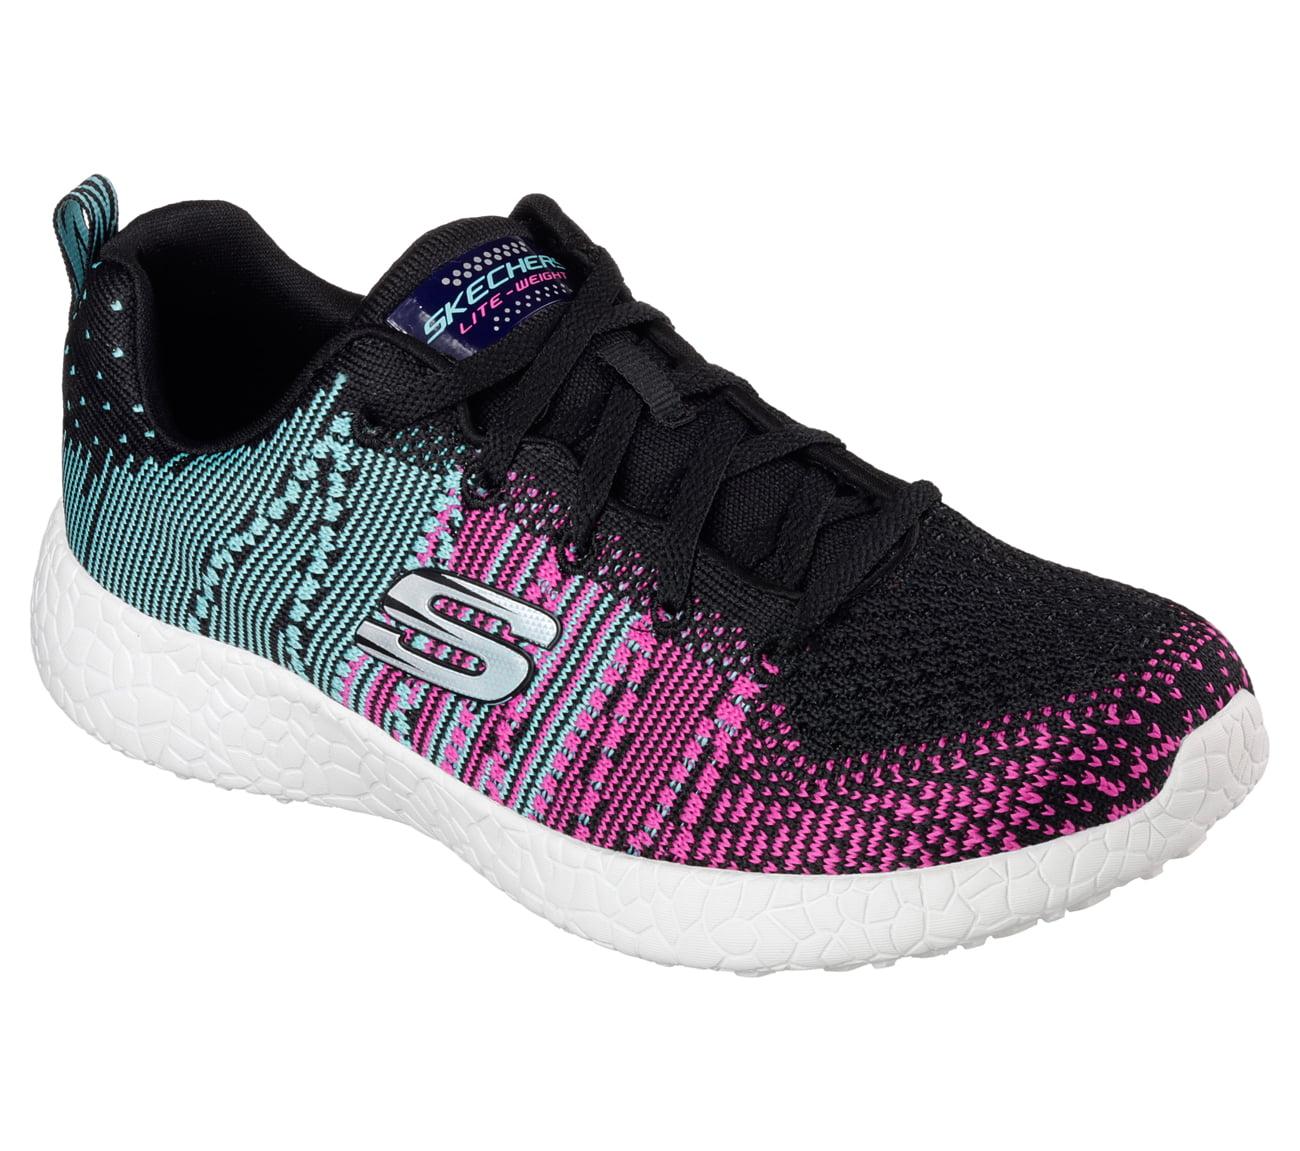 Details about Shoes Skechers Burst Ellipse Running Sneakers 12437 BBLP Woman Black Pink Blue